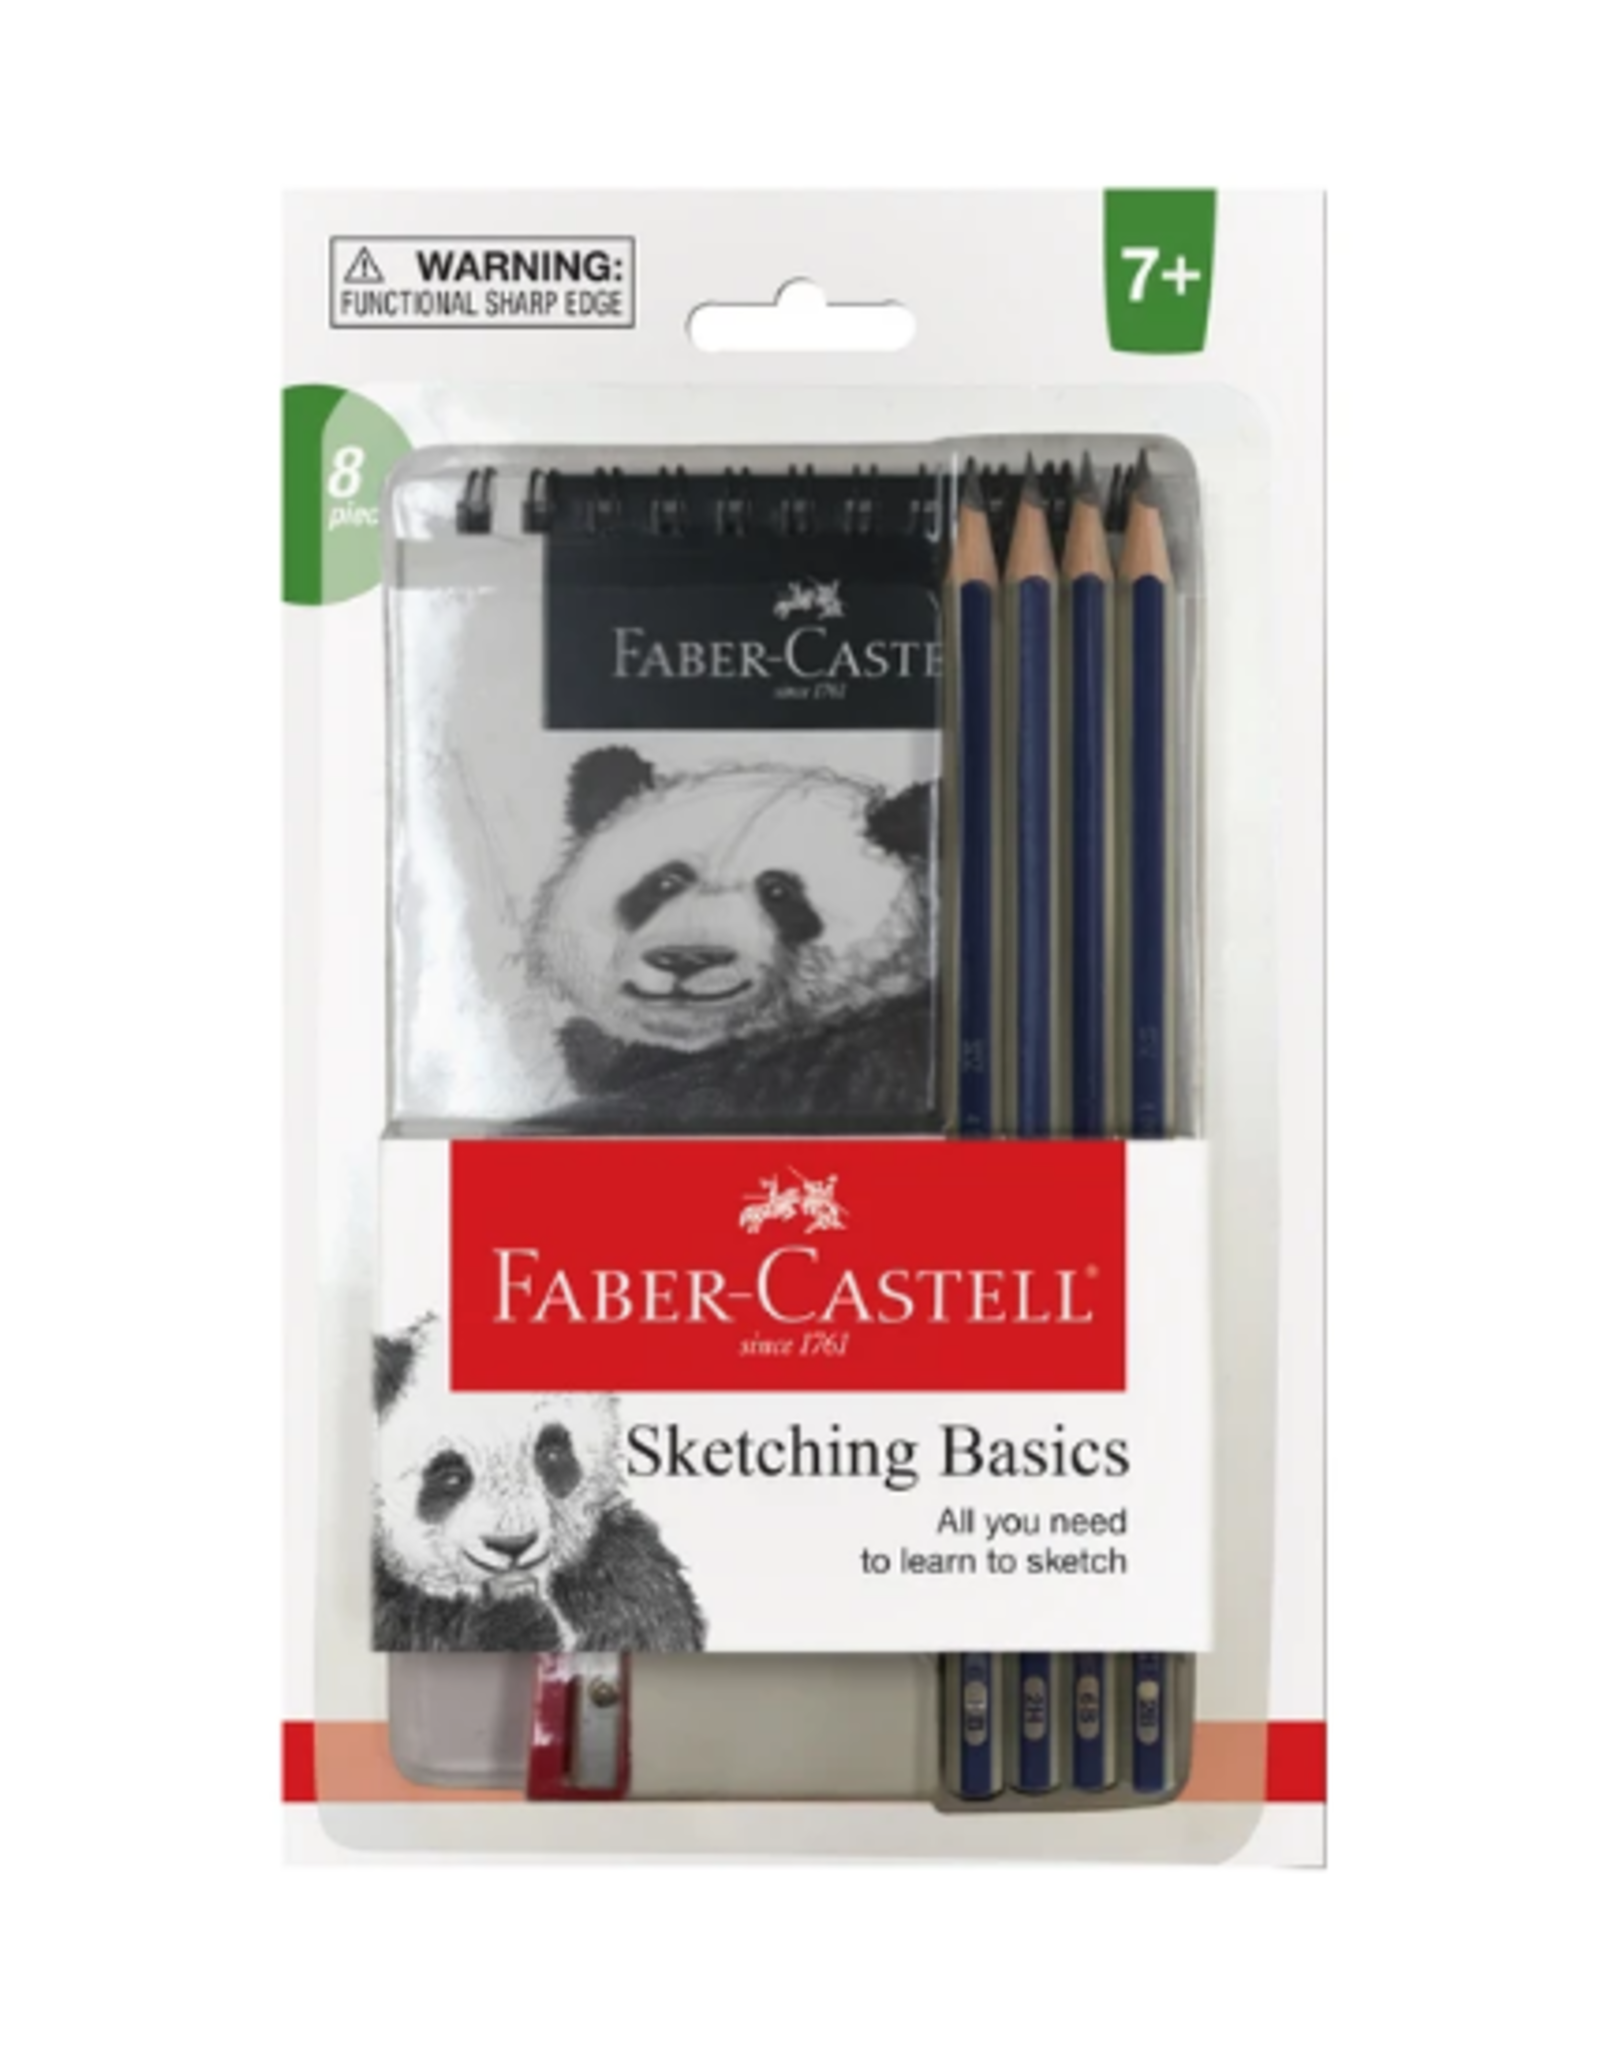 Faber-Castell Sketch Basics